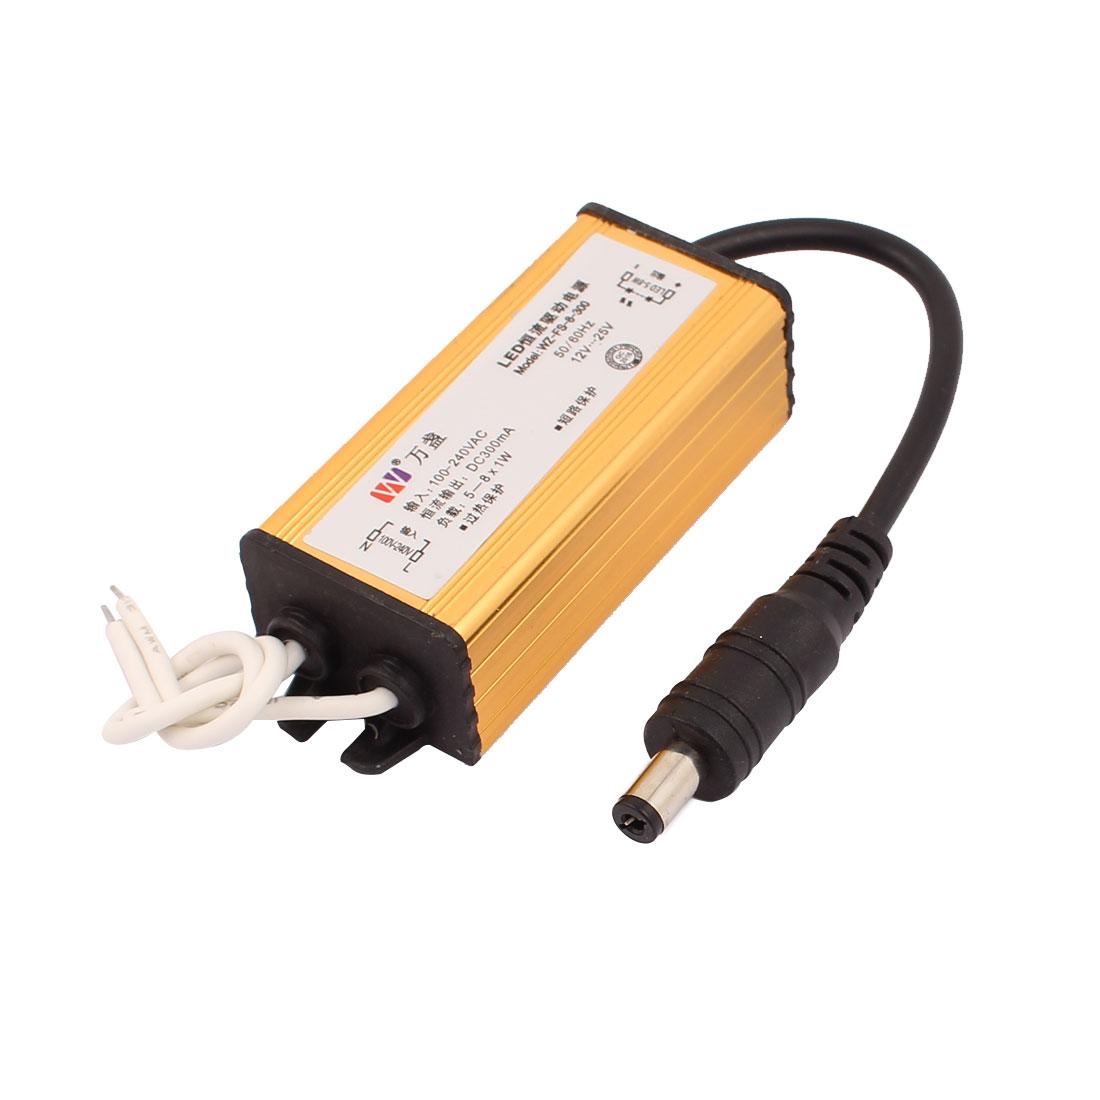 1 x 3W LED Light Driver IP66 Waterproof Power Supply DC3-5V 600mA